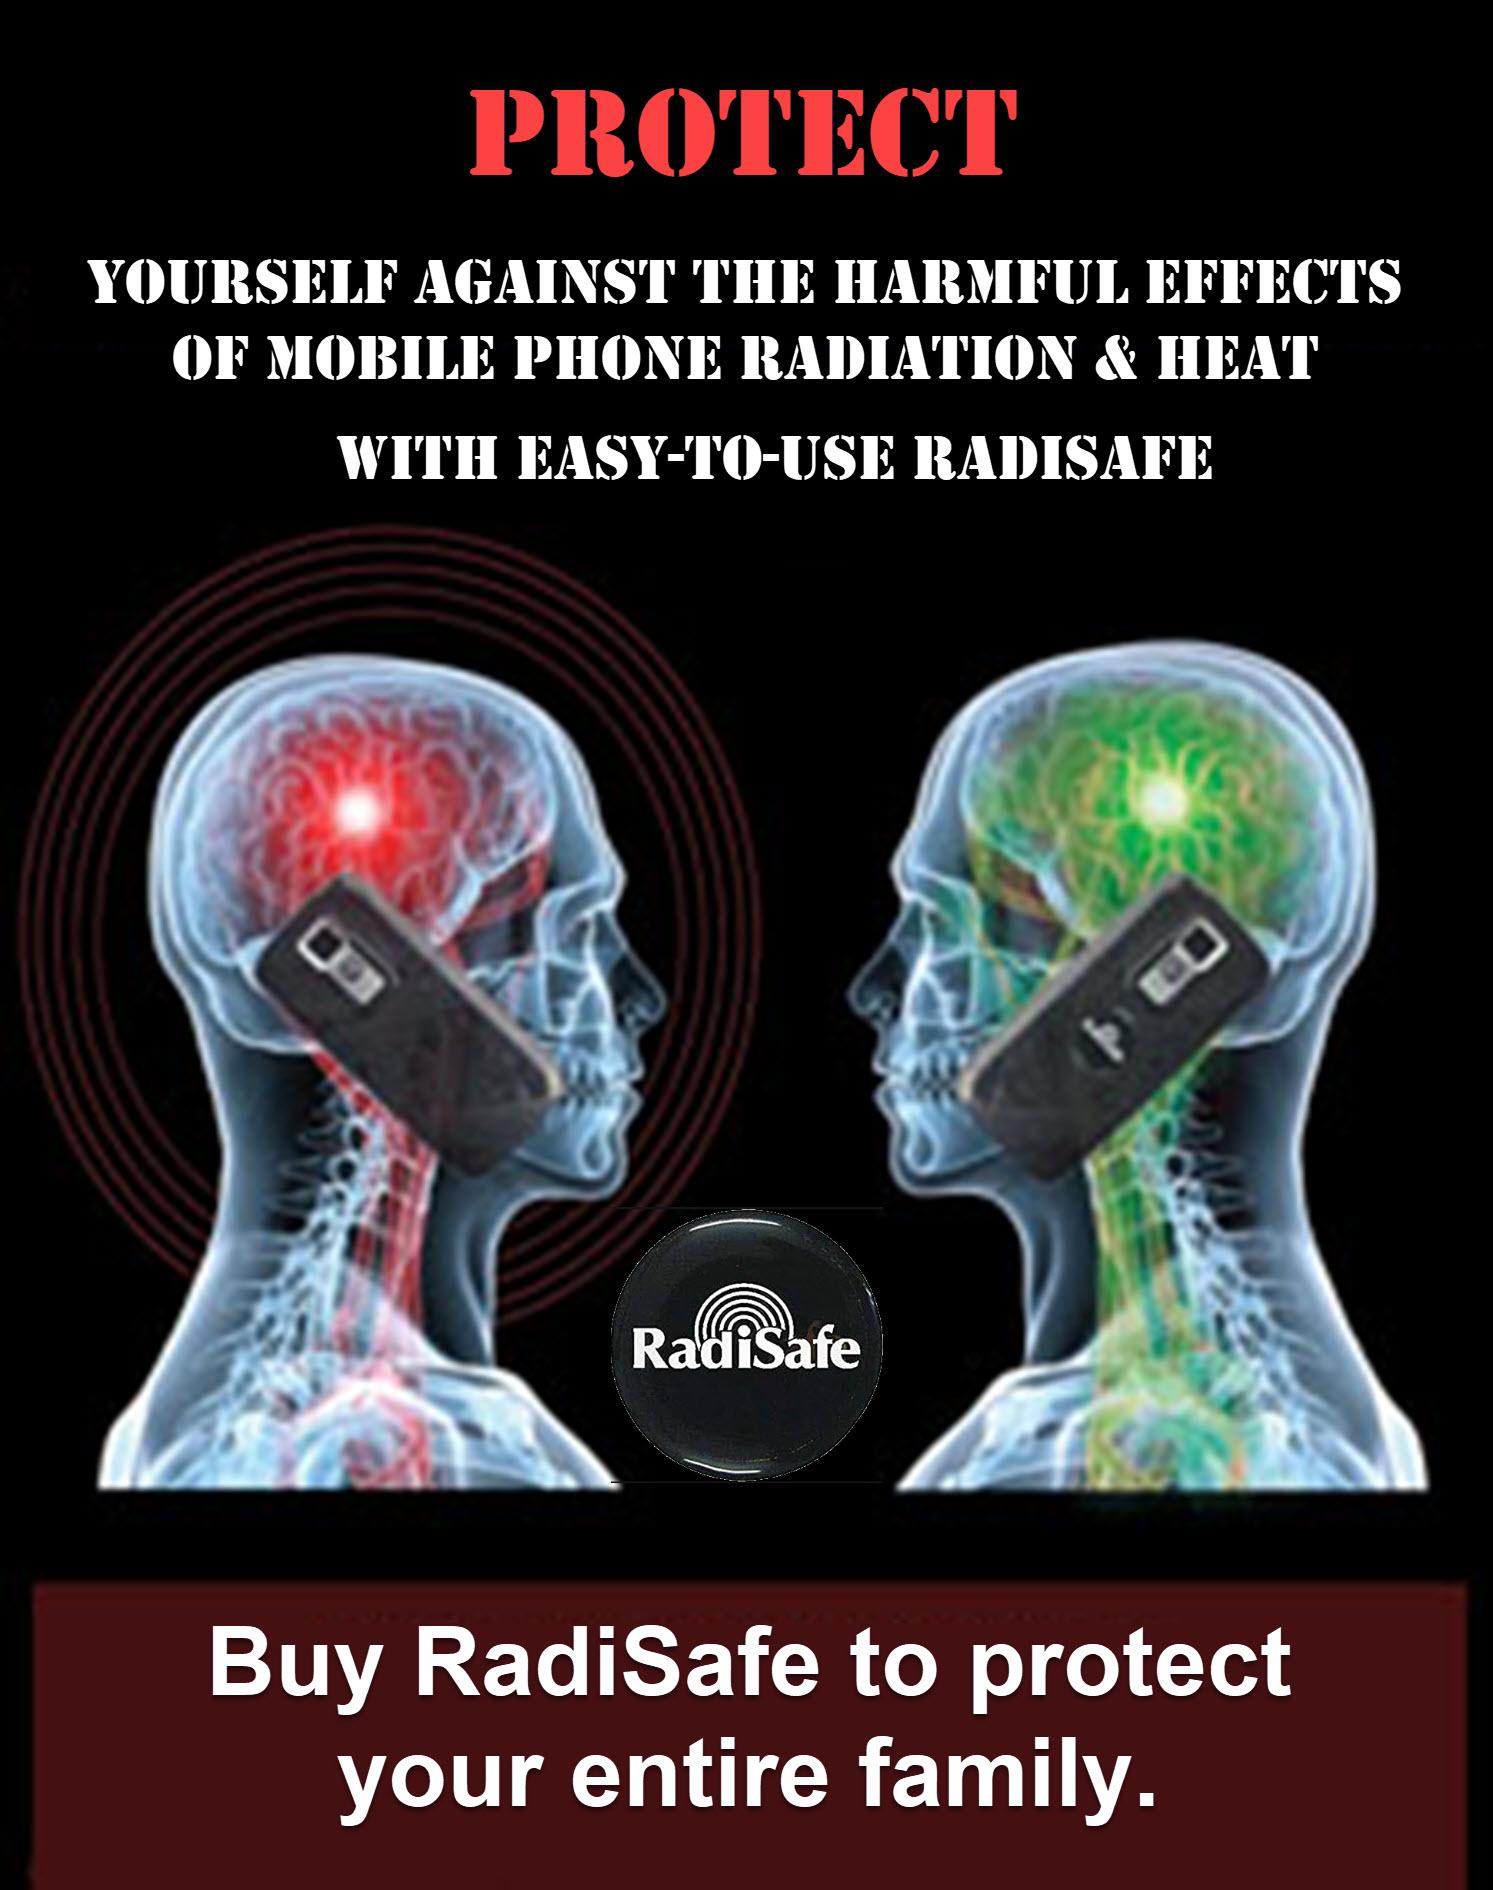 radisafe-image-green-red.jpg